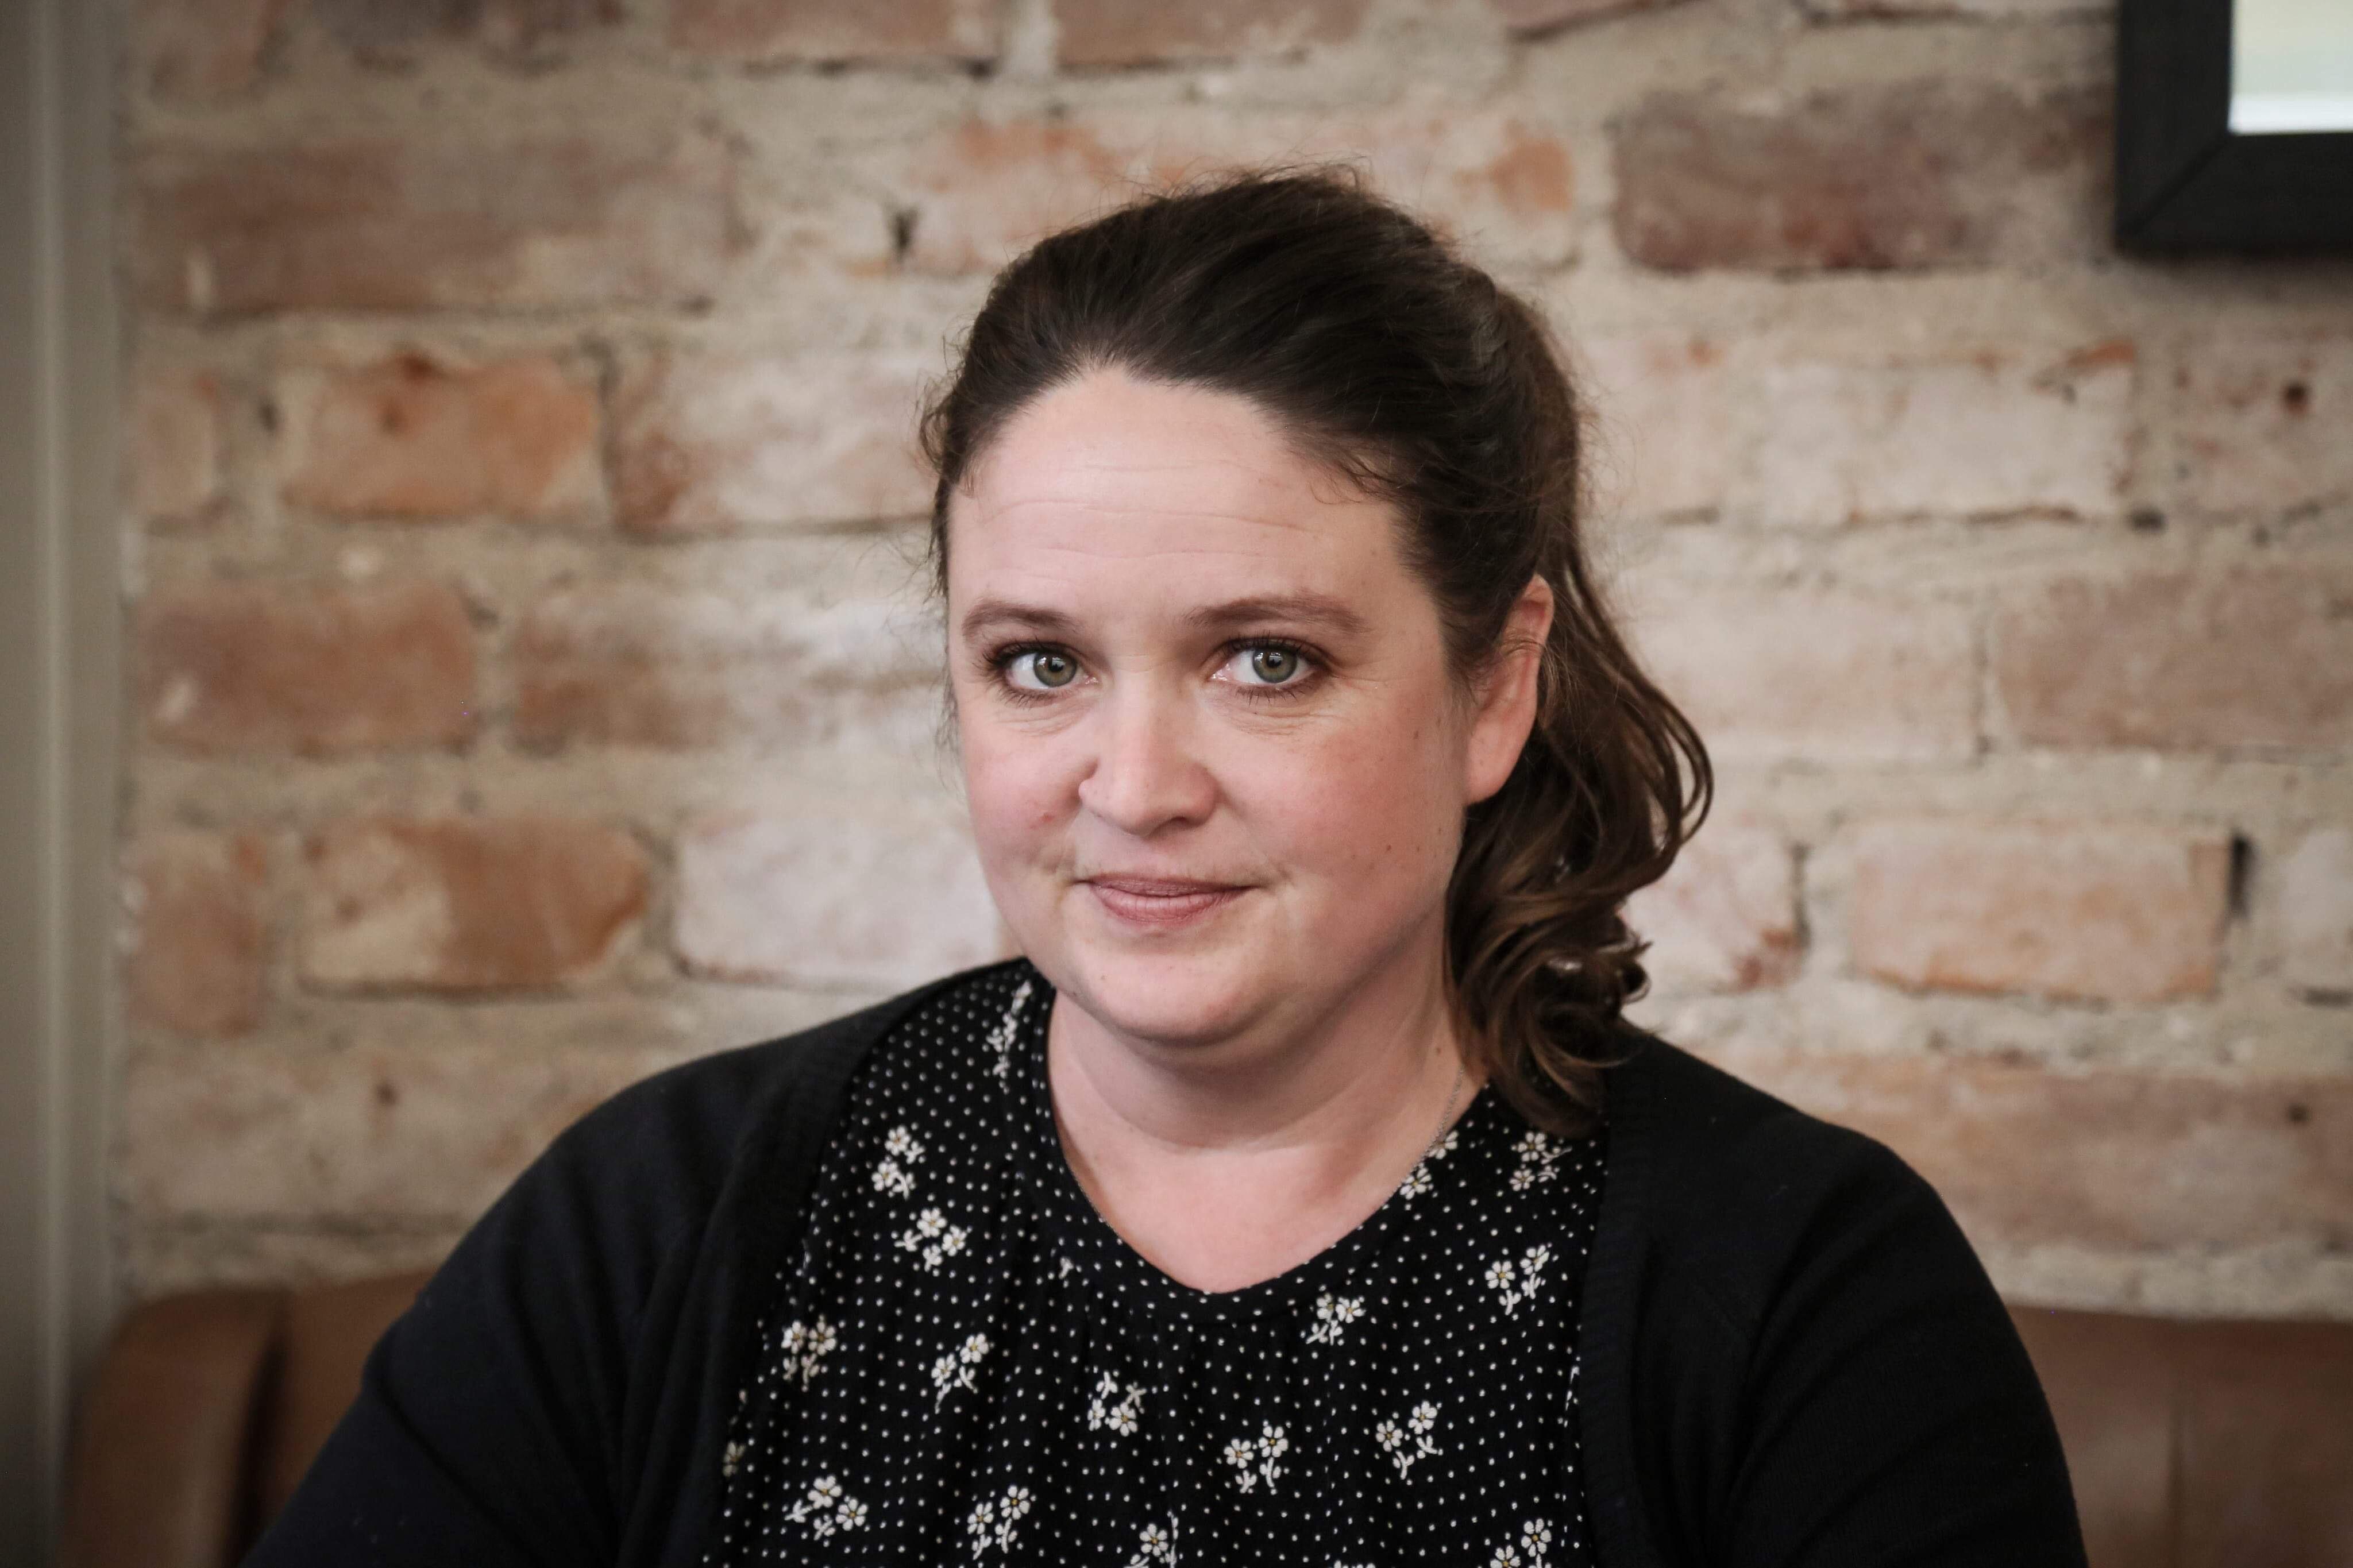 Hanna Landahl